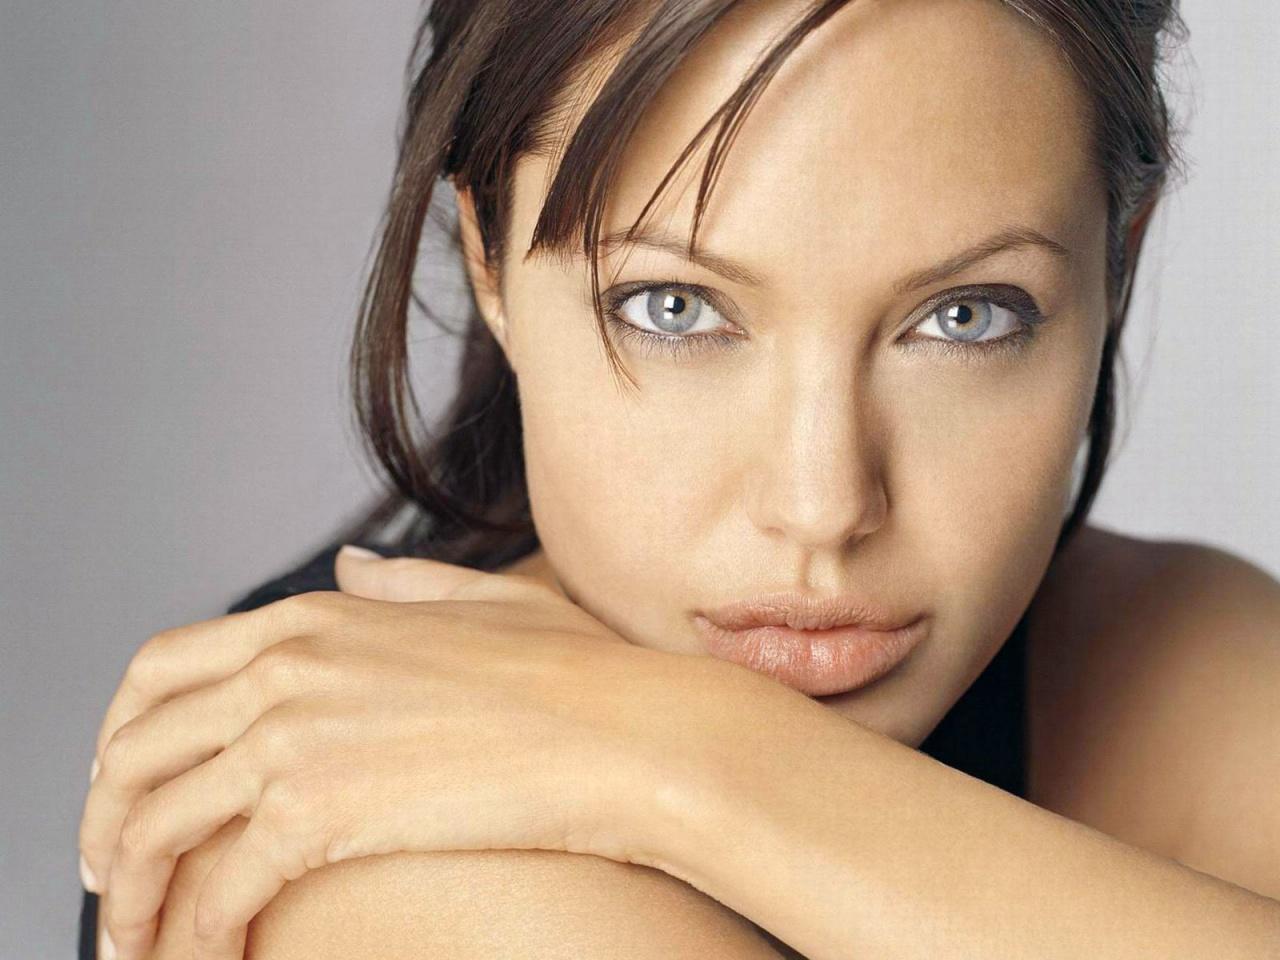 http://4.bp.blogspot.com/-9fZEbaXHvns/UN8n9xwQS7I/AAAAAAAABPY/TlwVxfu1_jg/s1600/Angelina+Jolie+hot+boobs+visible.jpg